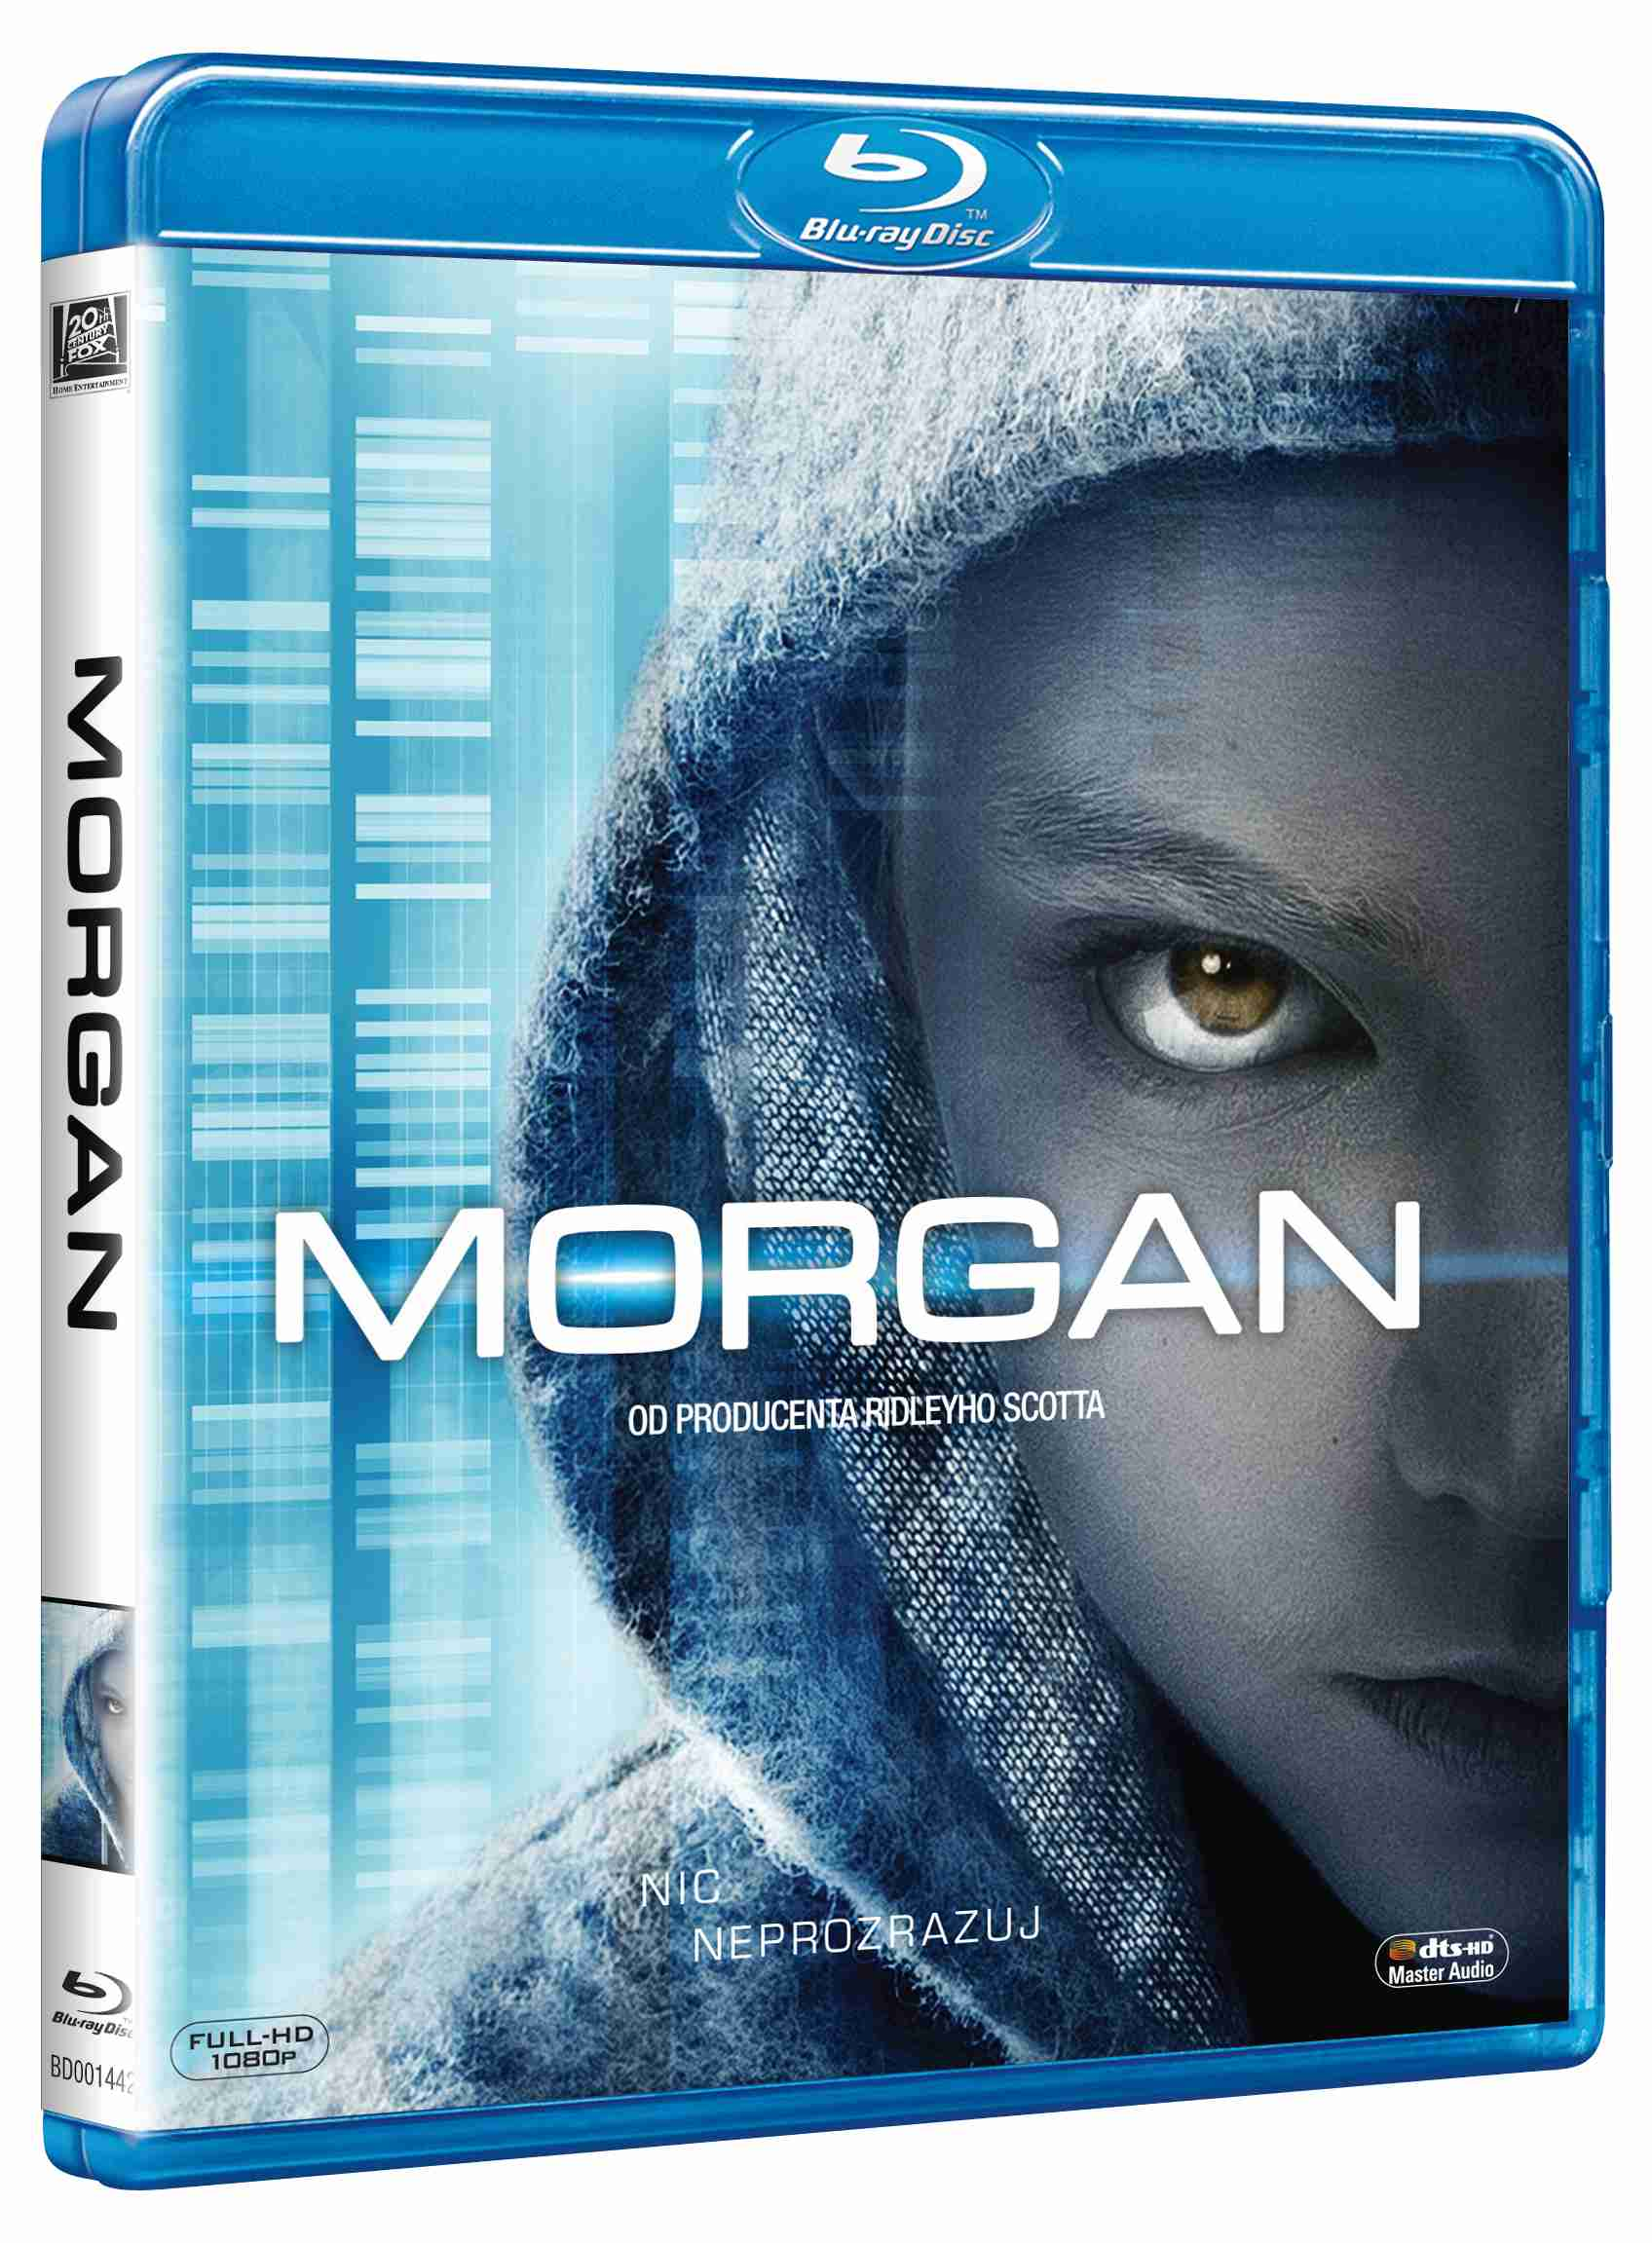 MORGAN - Blu-ray